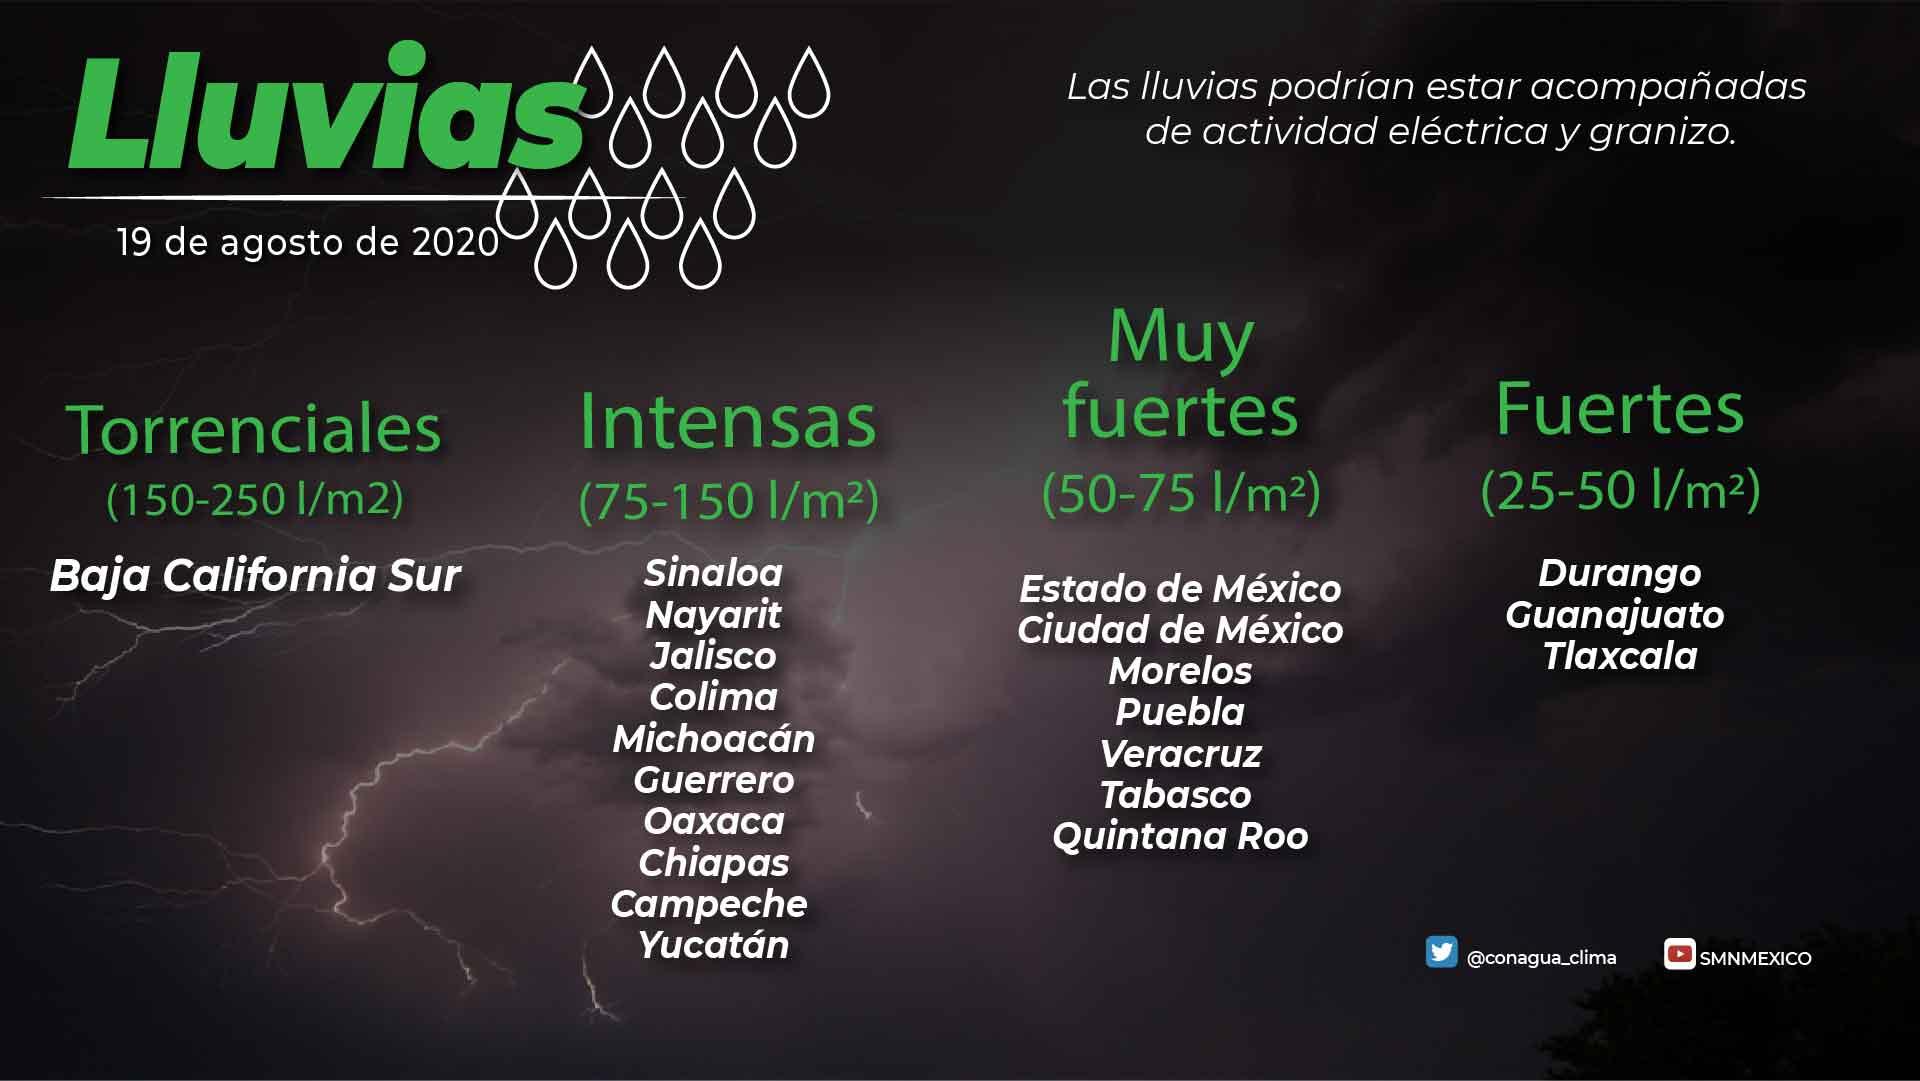 Huracán Genevieve ocasionará lluvias intensas en Baja California Sur, Colima, Jalisco, Nayarit y Sinaloa